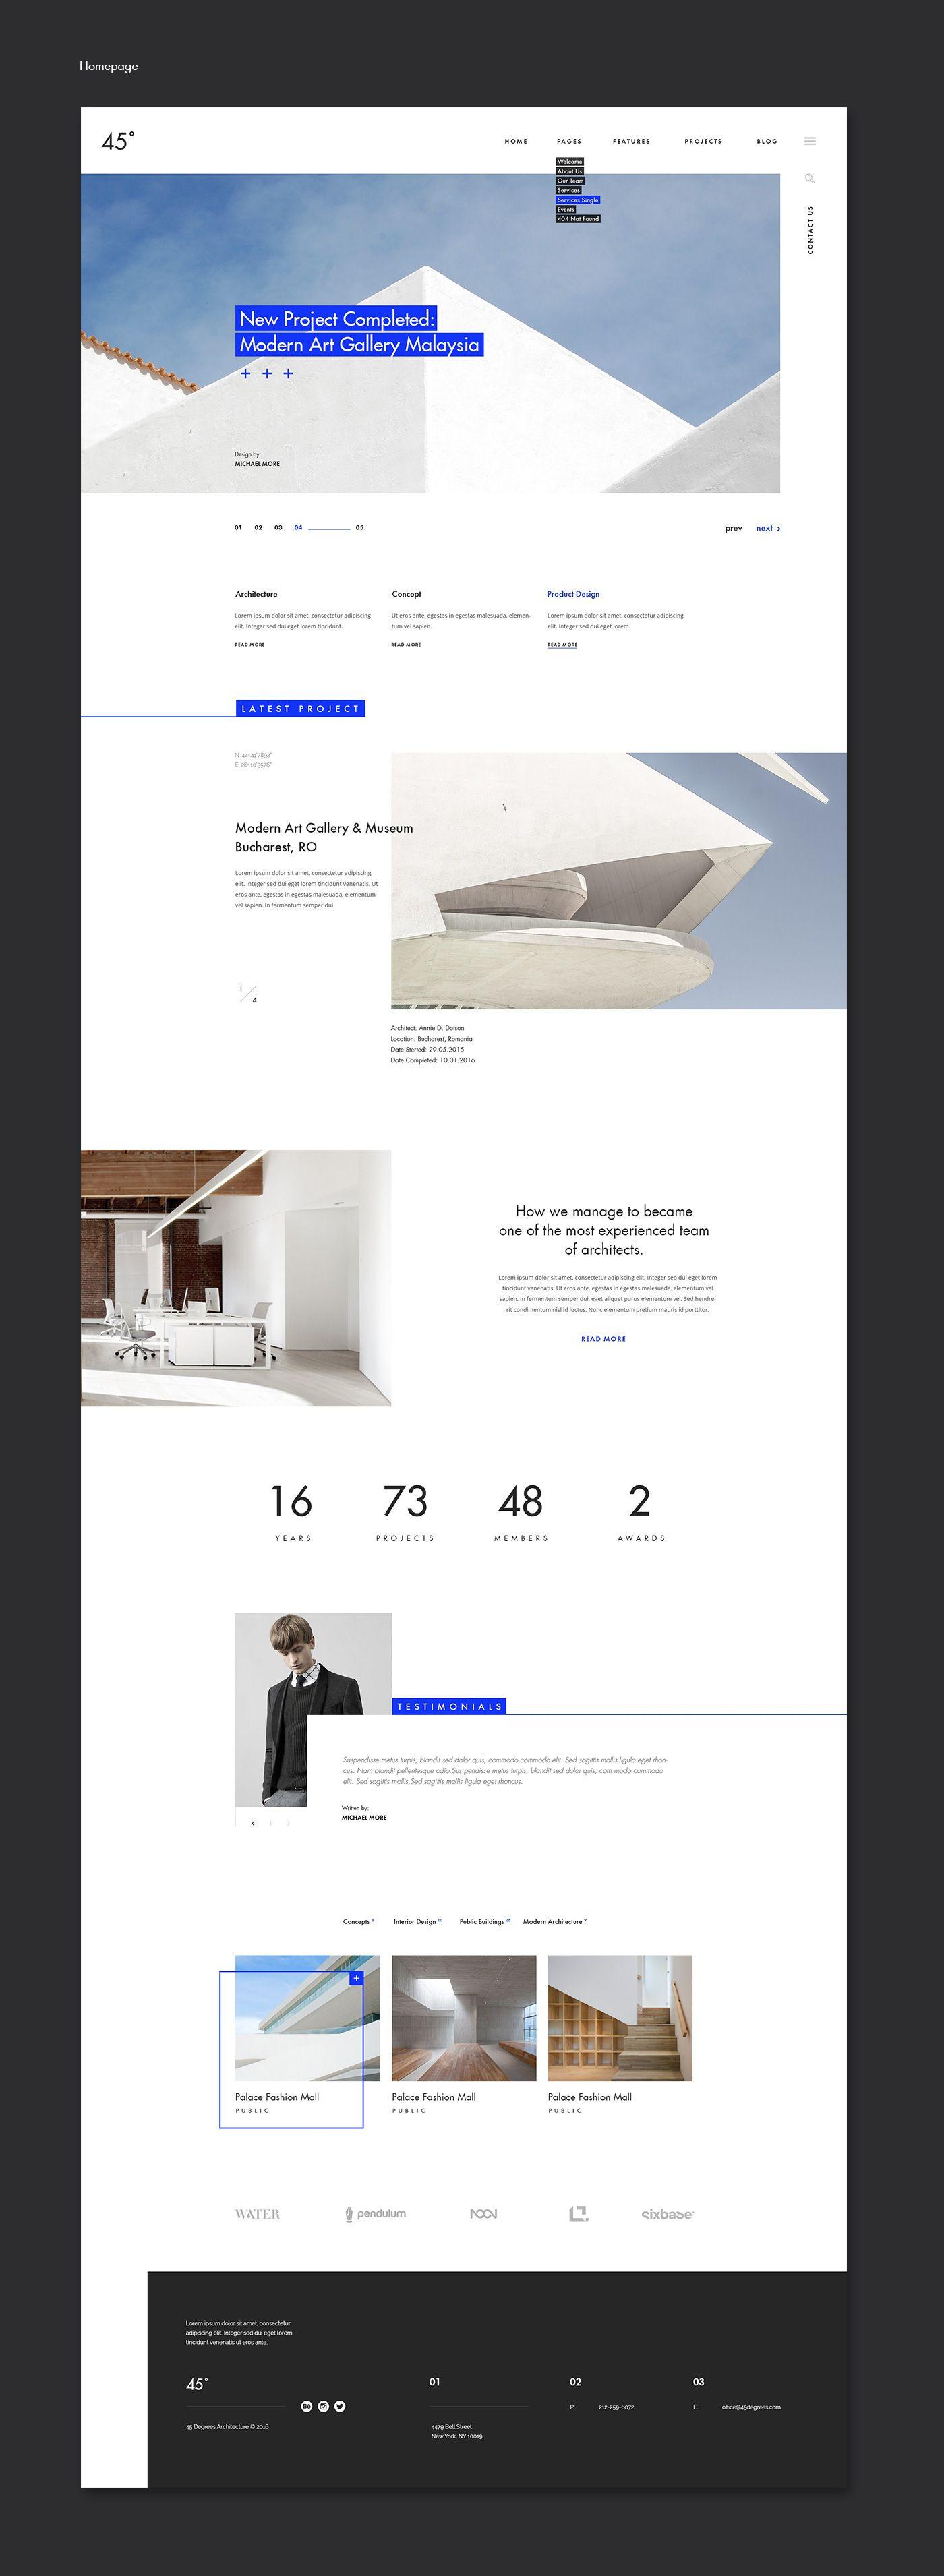 45 degrees - Architecture Studio PSD | themeforest.net on Behance